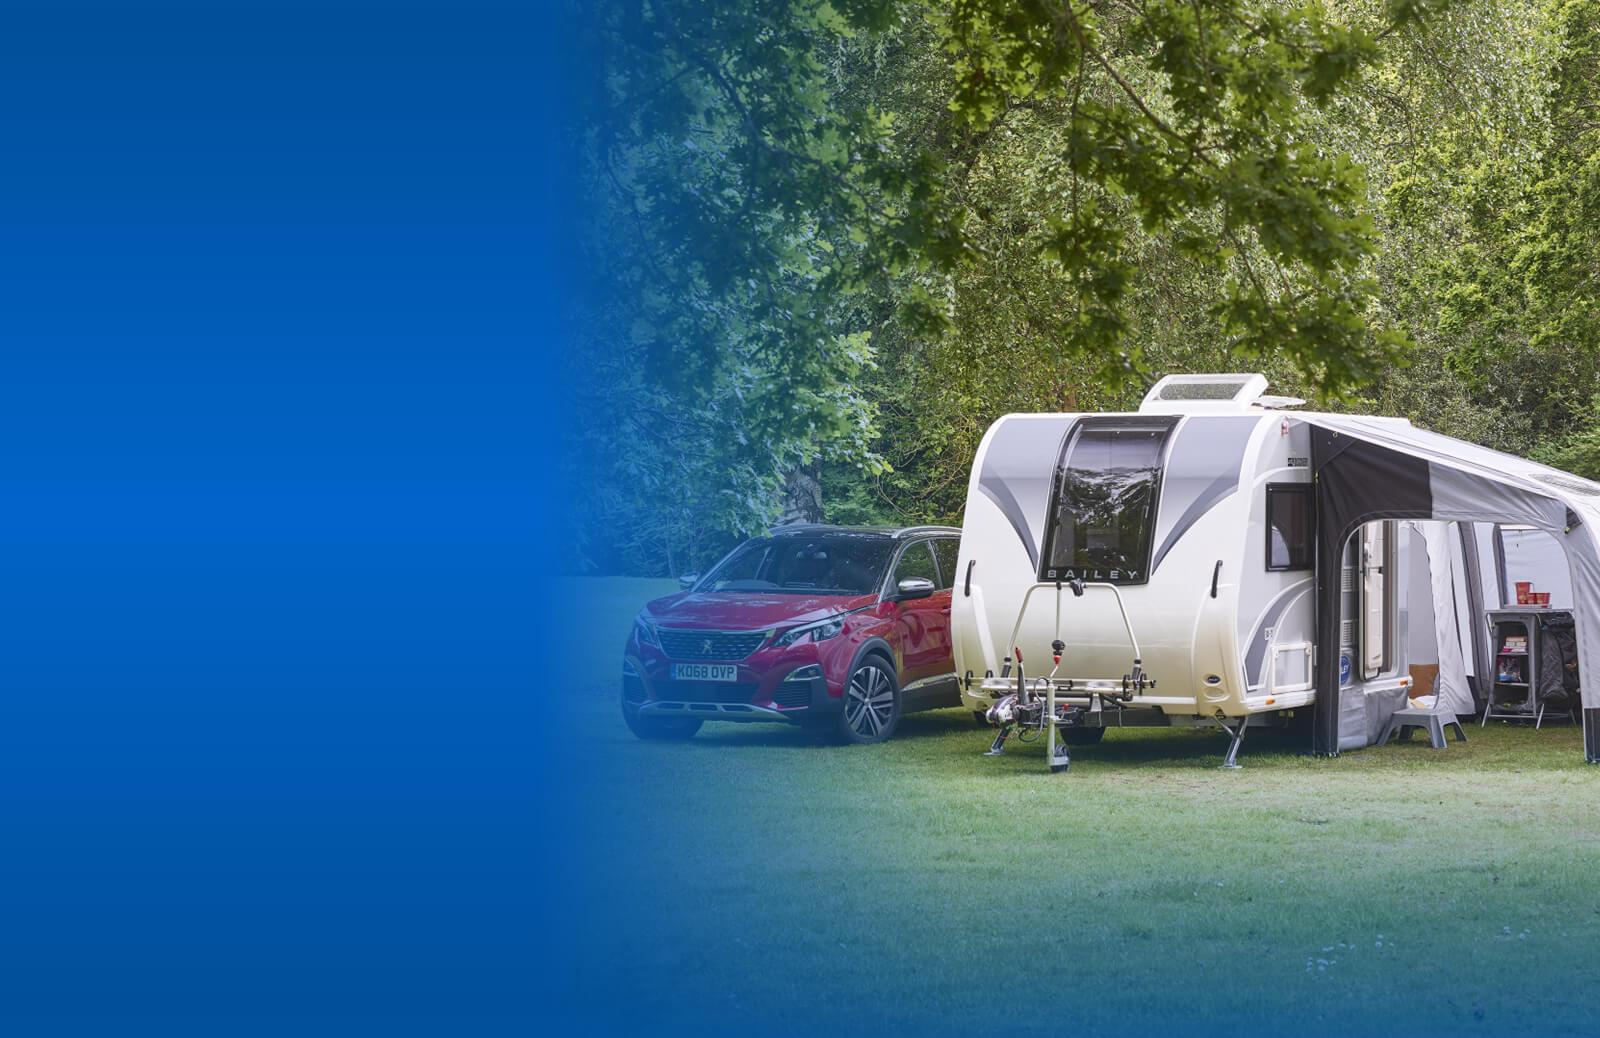 New Bailey caravans from Bailey of Bristol